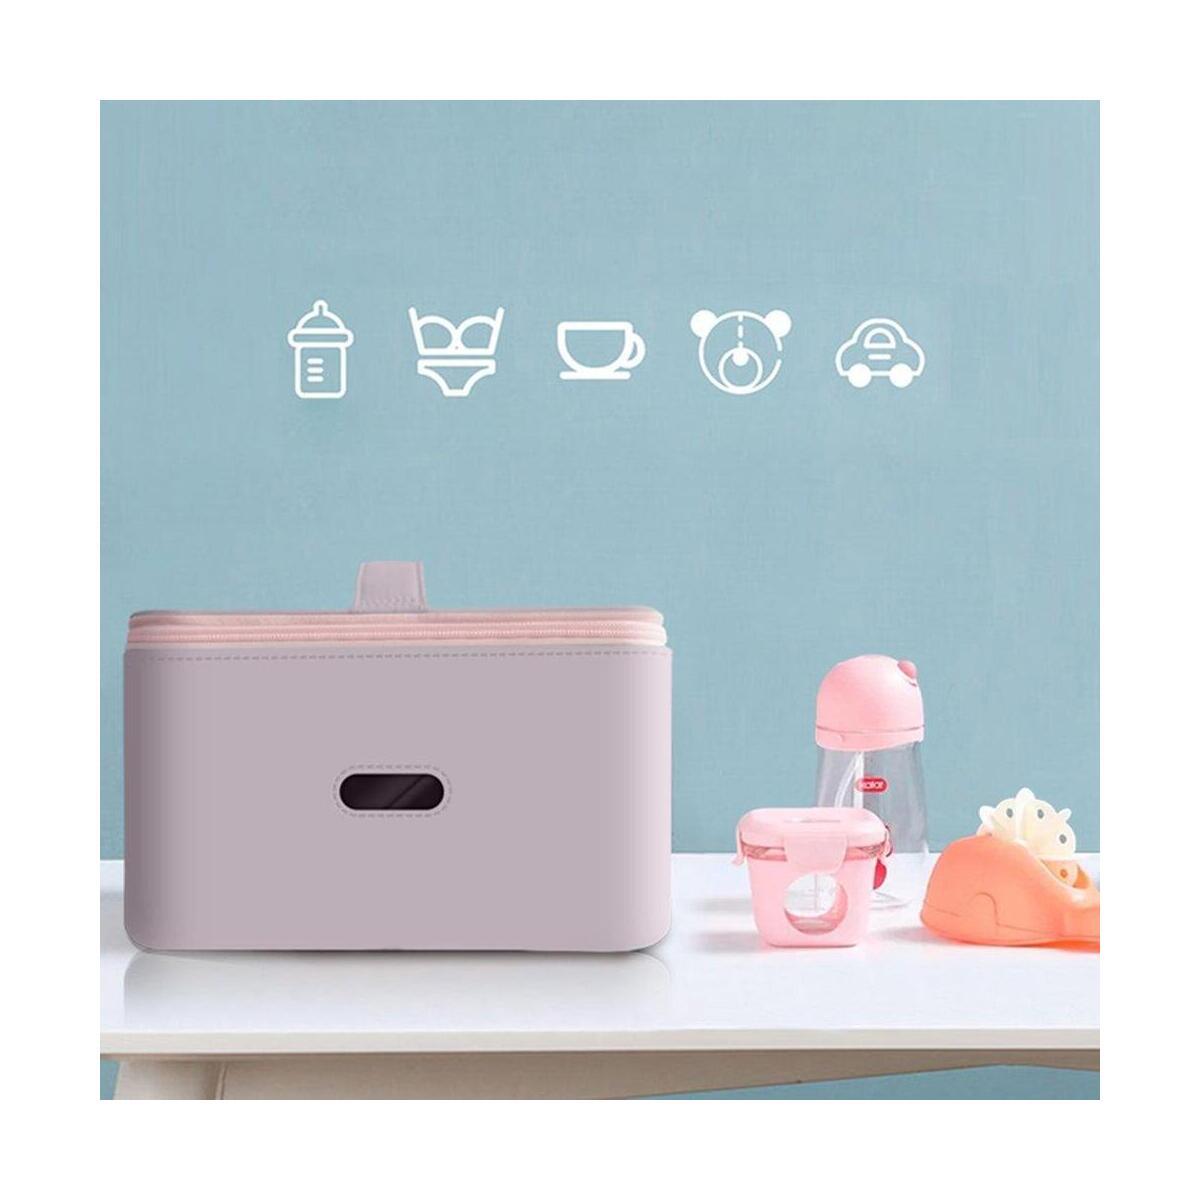 UV Sterilizer Bag UV Disinfection Bags Portable Sterilizer Box UV Baby Bottle Cleaner Waterproof UV Travel Sterilization Bag